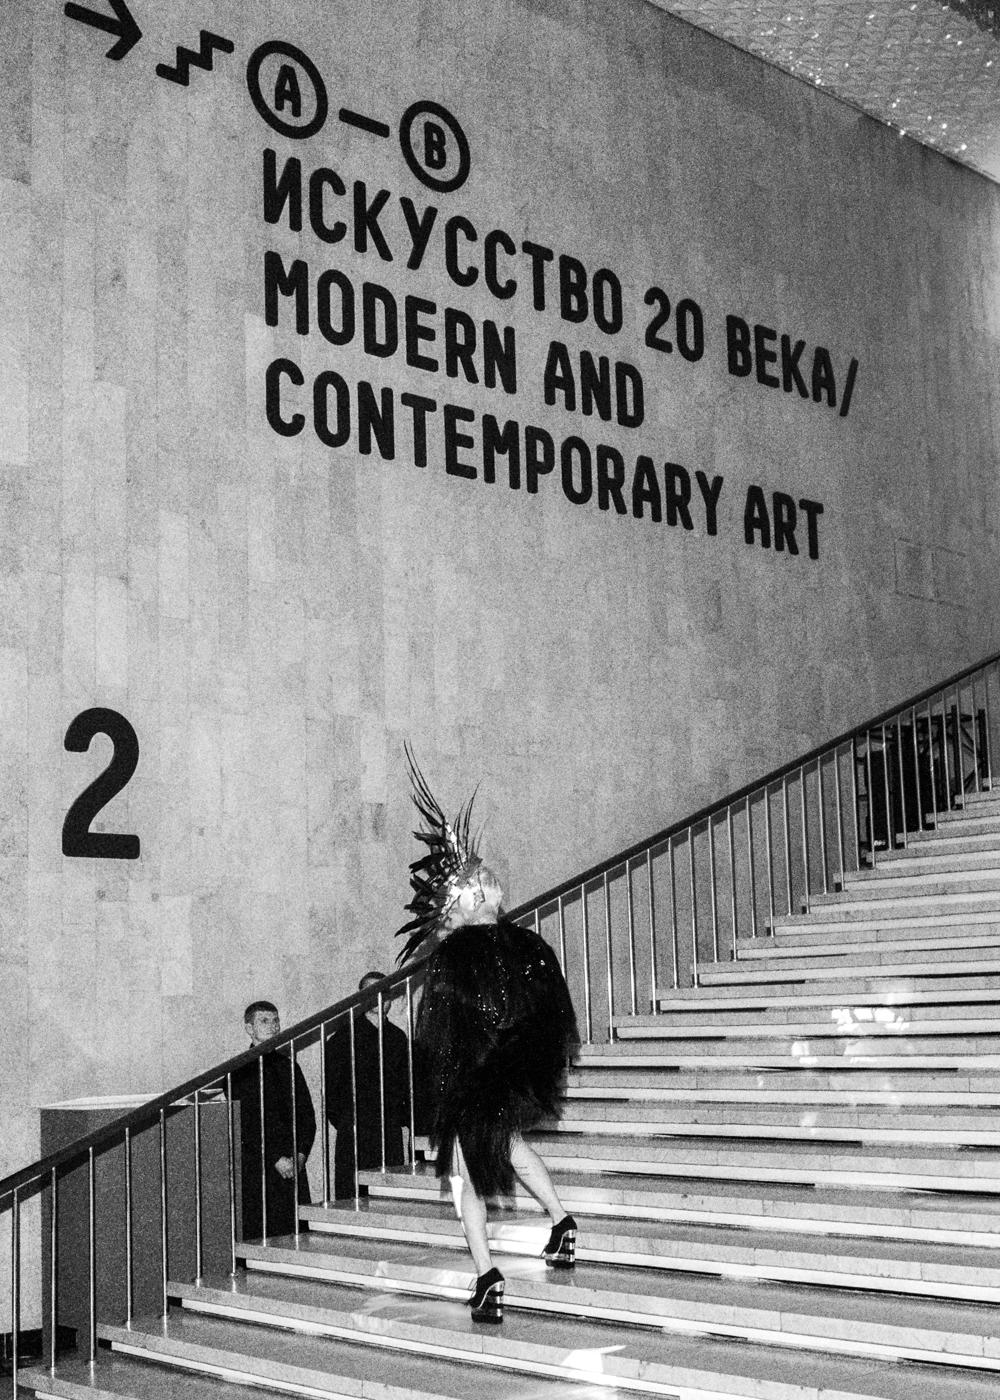 012 Vogue Russia 20 (@roma_ivanov) small.jpg